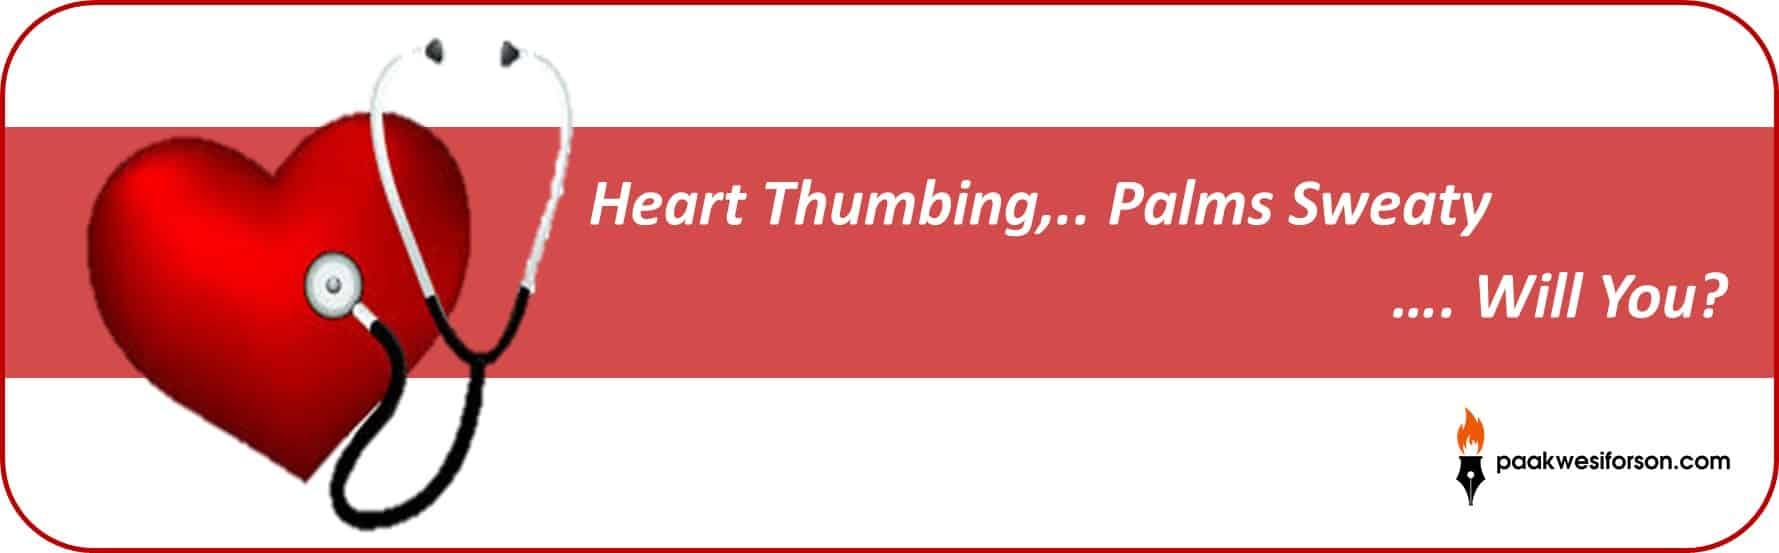 Heart_Thumbing_Palms_Sweaty_._Will_You